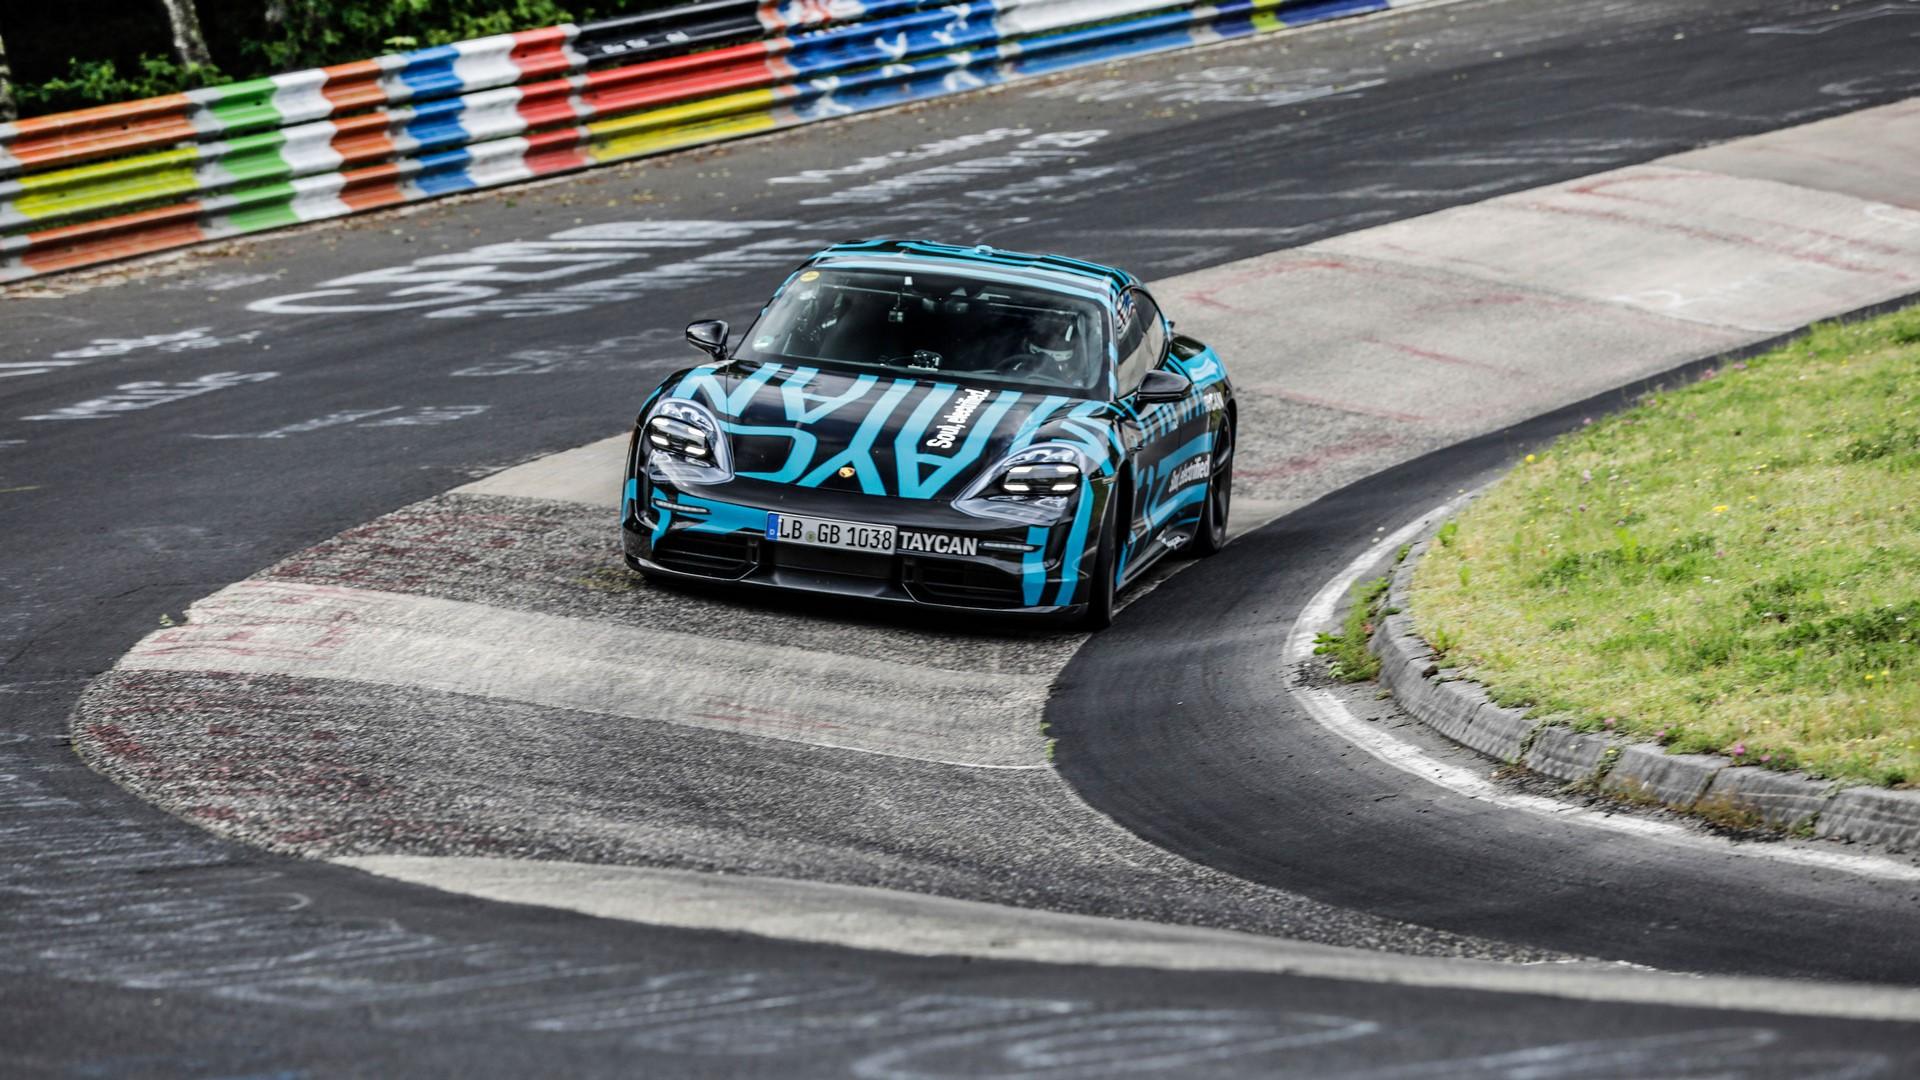 Porsche-Taycan-Nurburgring-record-8